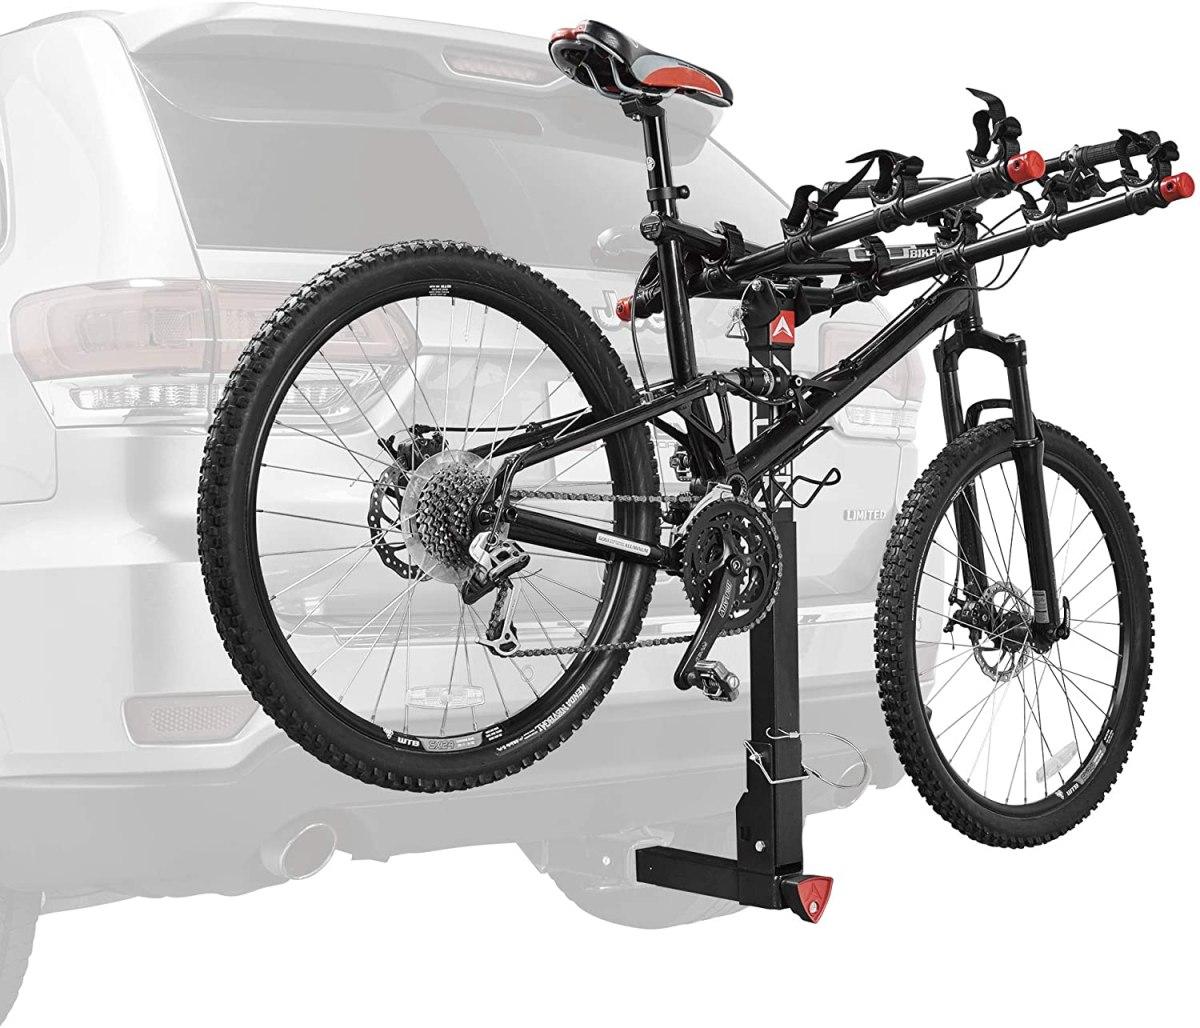 Best Bike Hitch Mount for Family of 5: Allen SportsHitch